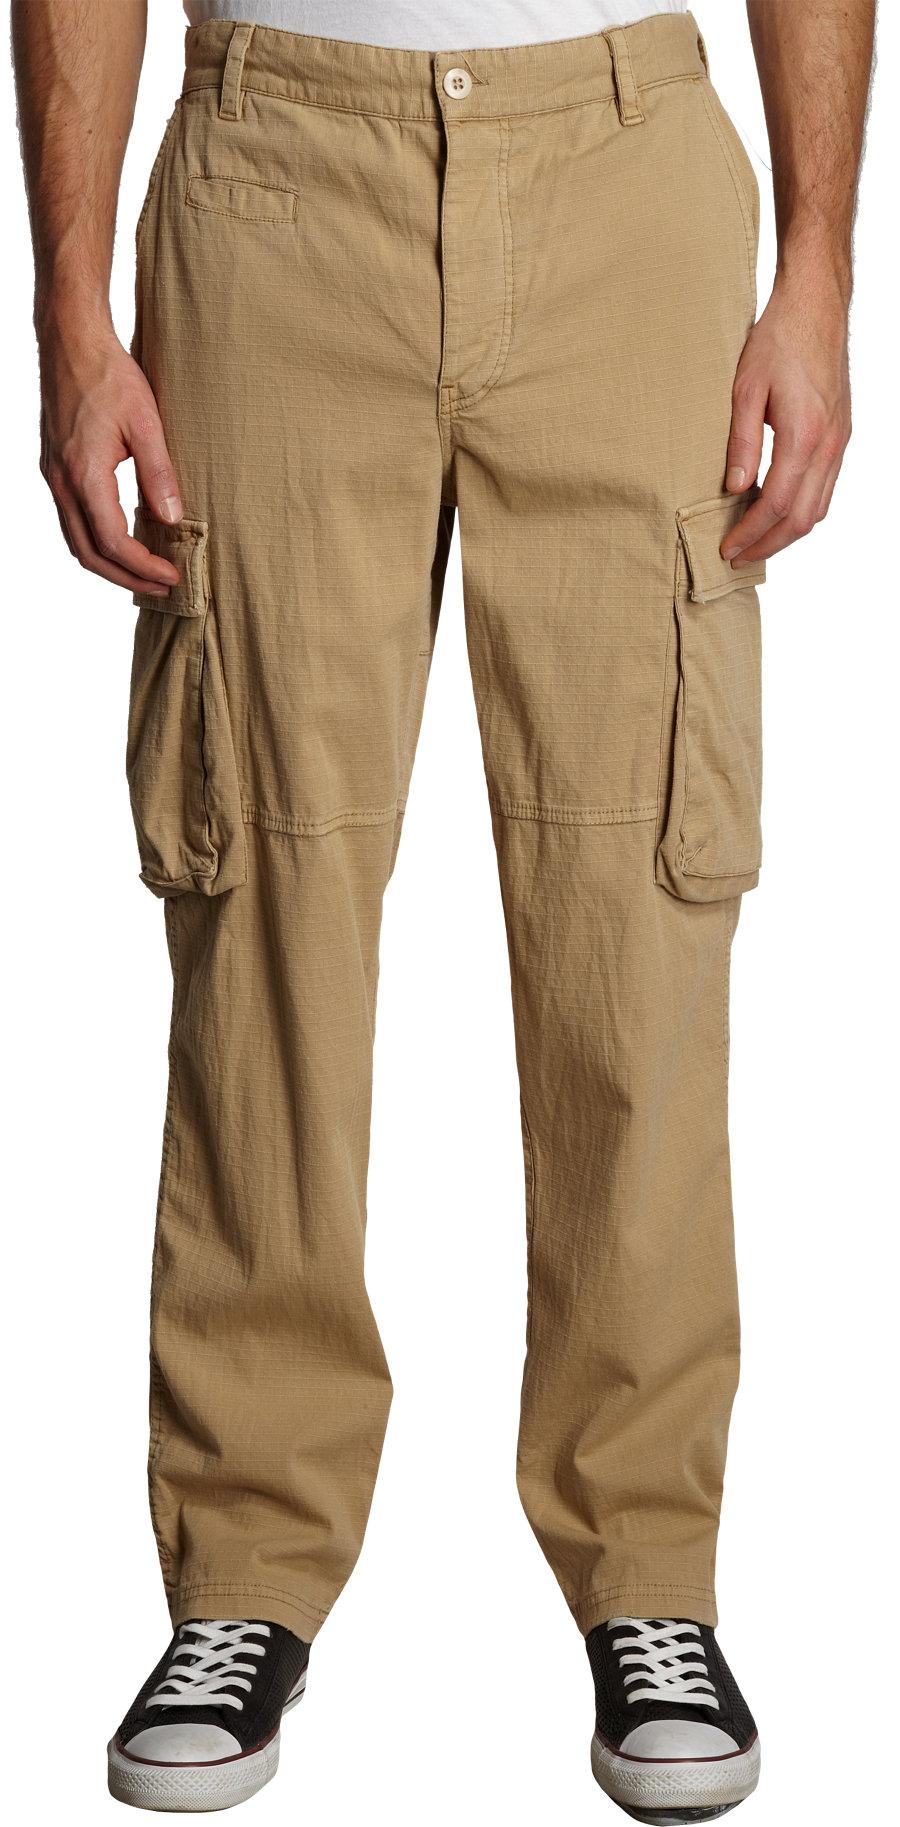 Nsf Clothing Ripstop Surplus Cargo Pants in Khaki for Men ...